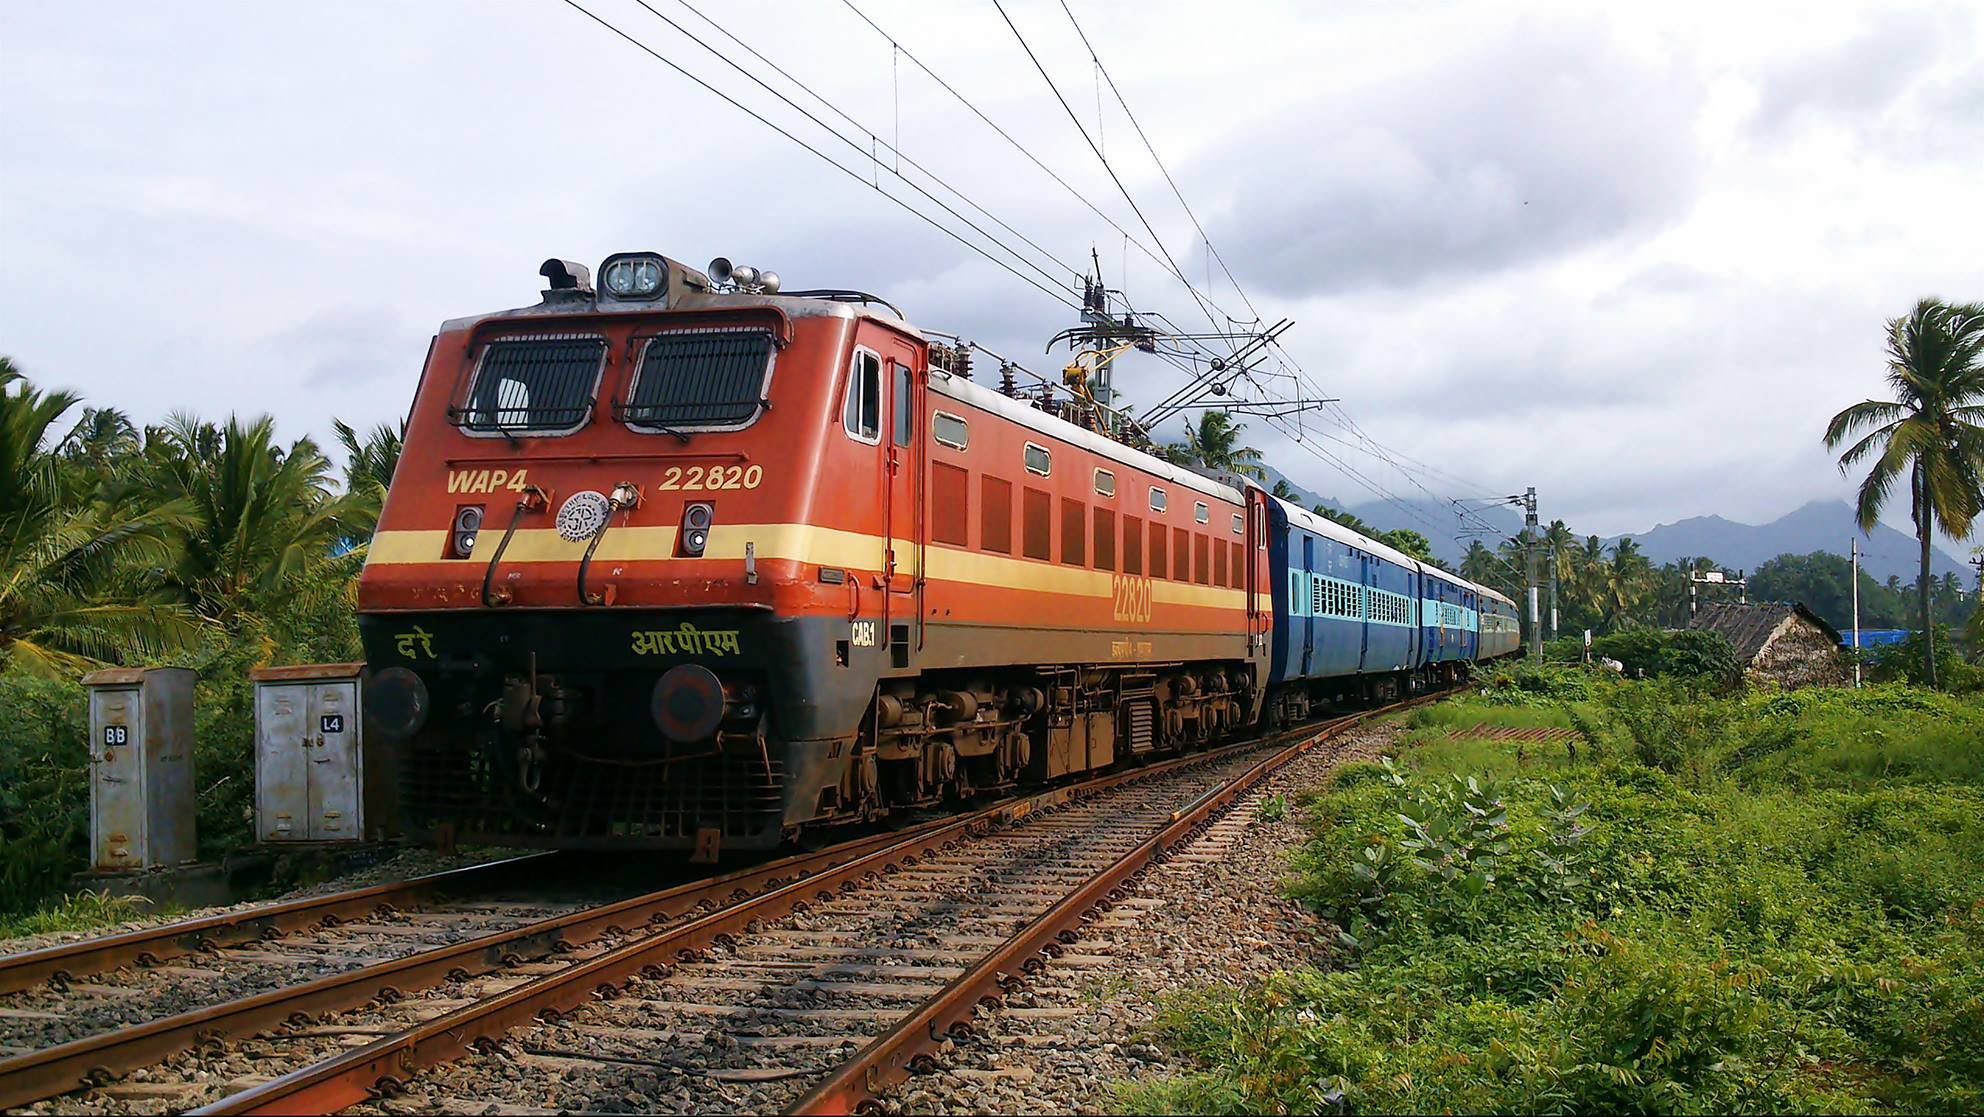 WAP-4_Class_locomotive_of_Indian_Railways (1)